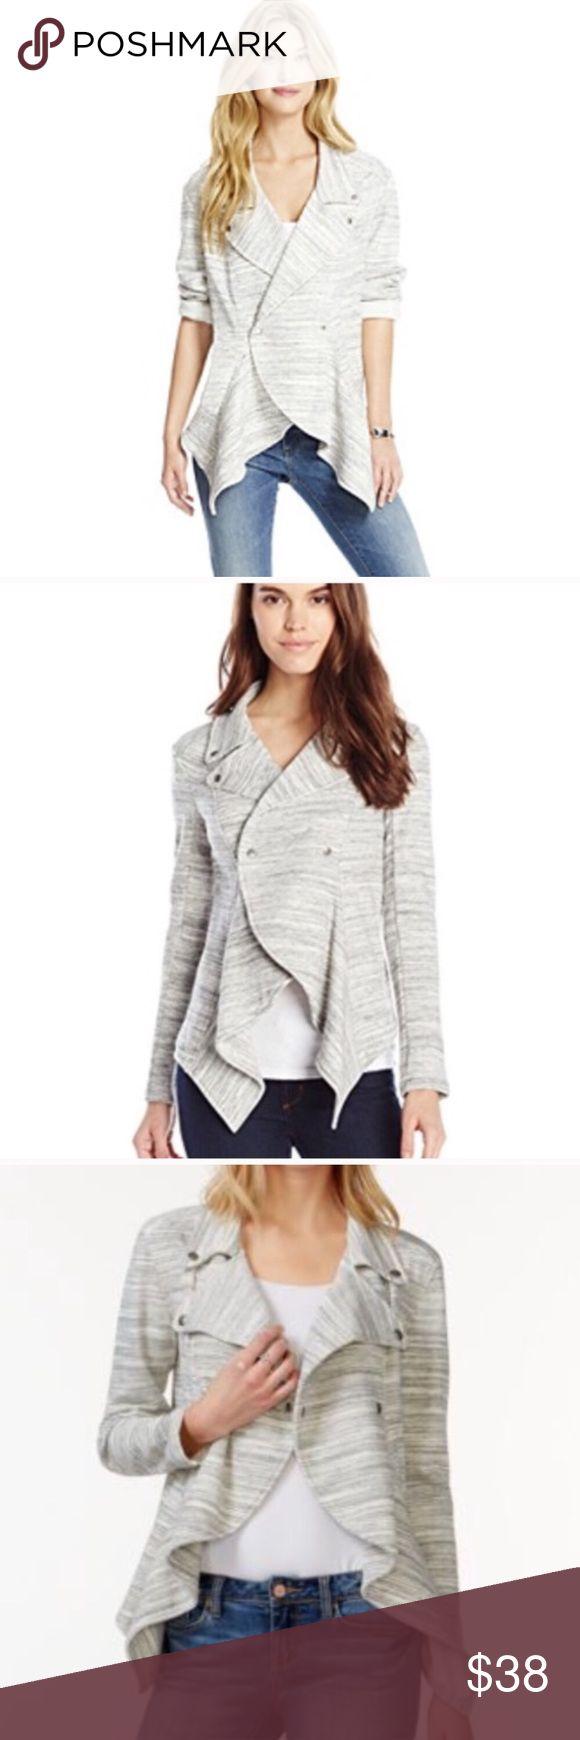 ✨NWT✨Jessica Simpson Marlow jacket Heather grey & white Jessica Simpson Marlow moto jacket. Comfy & chic. Button closure. Cotton/poly/viscose. Brand New Jessica Simpson Jackets & Coats